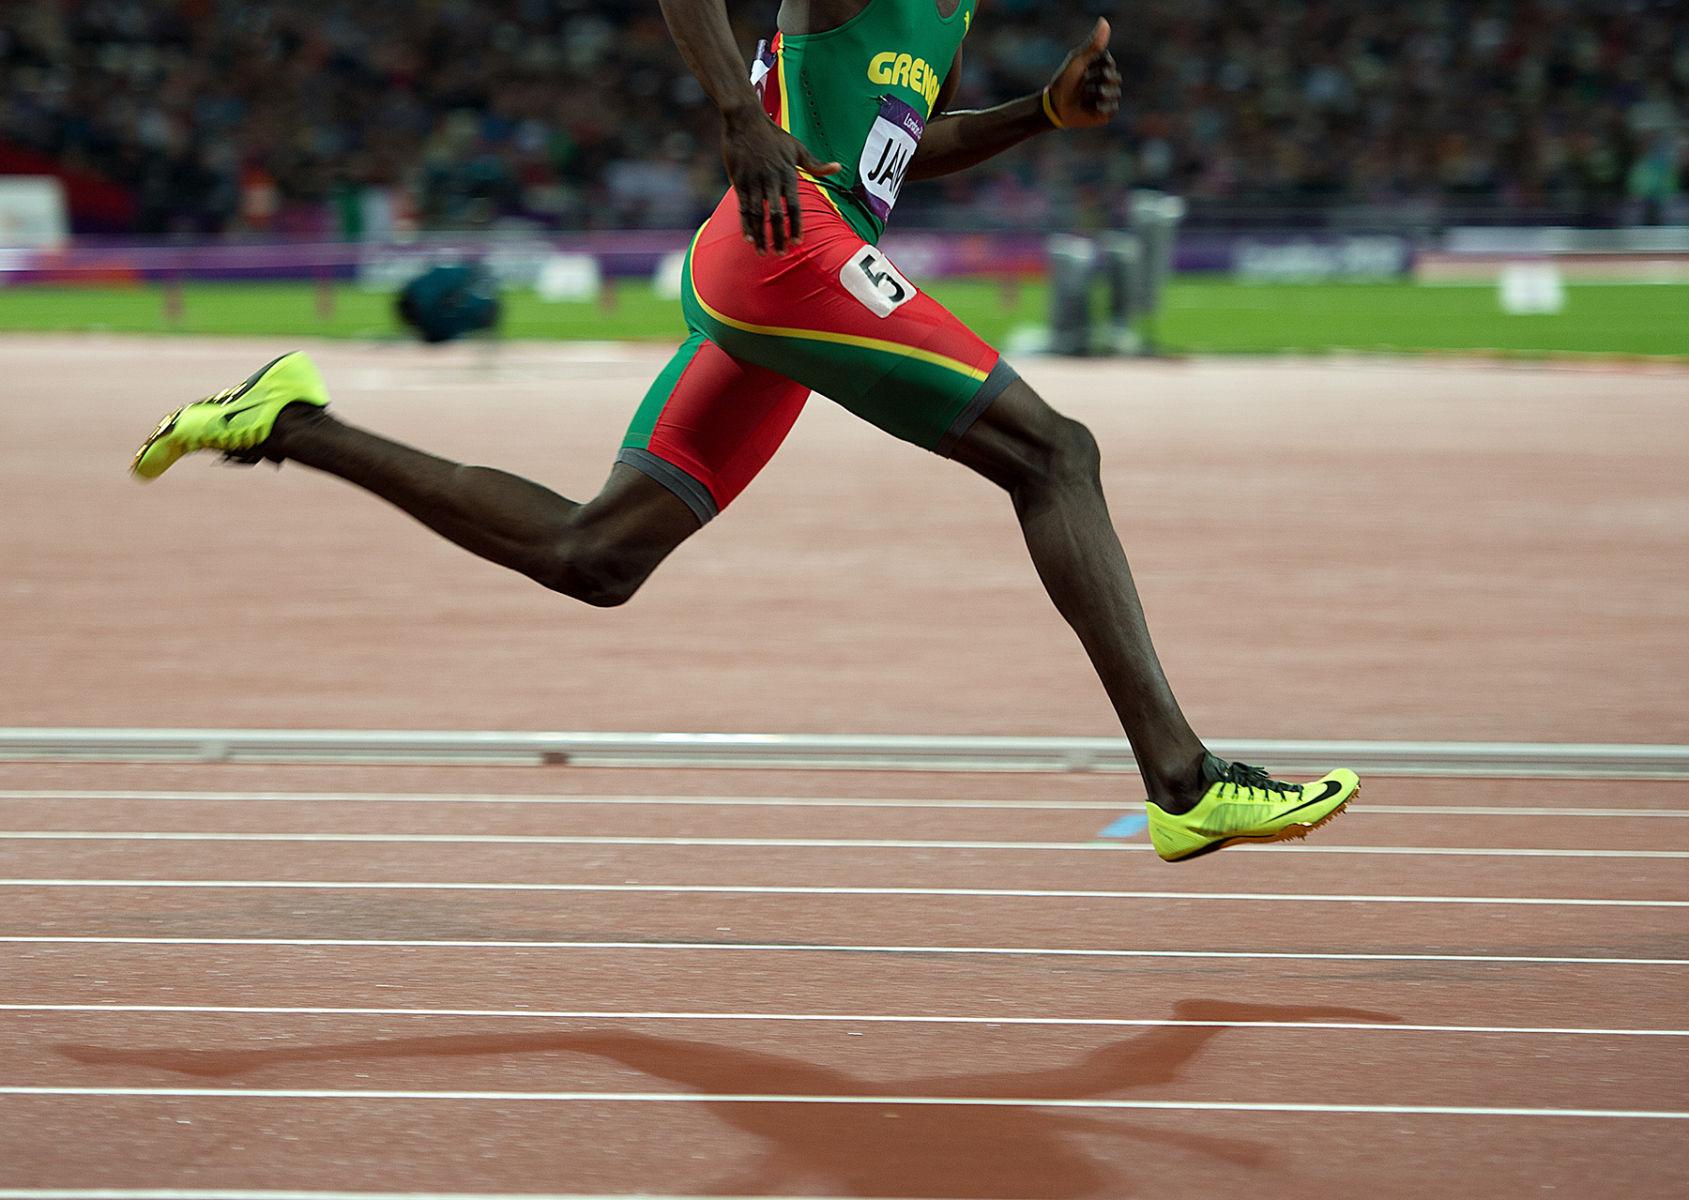 1london2012_kirani_james_legs_400_track_and_field_image_jeff_cohen_photo_lb.jpg